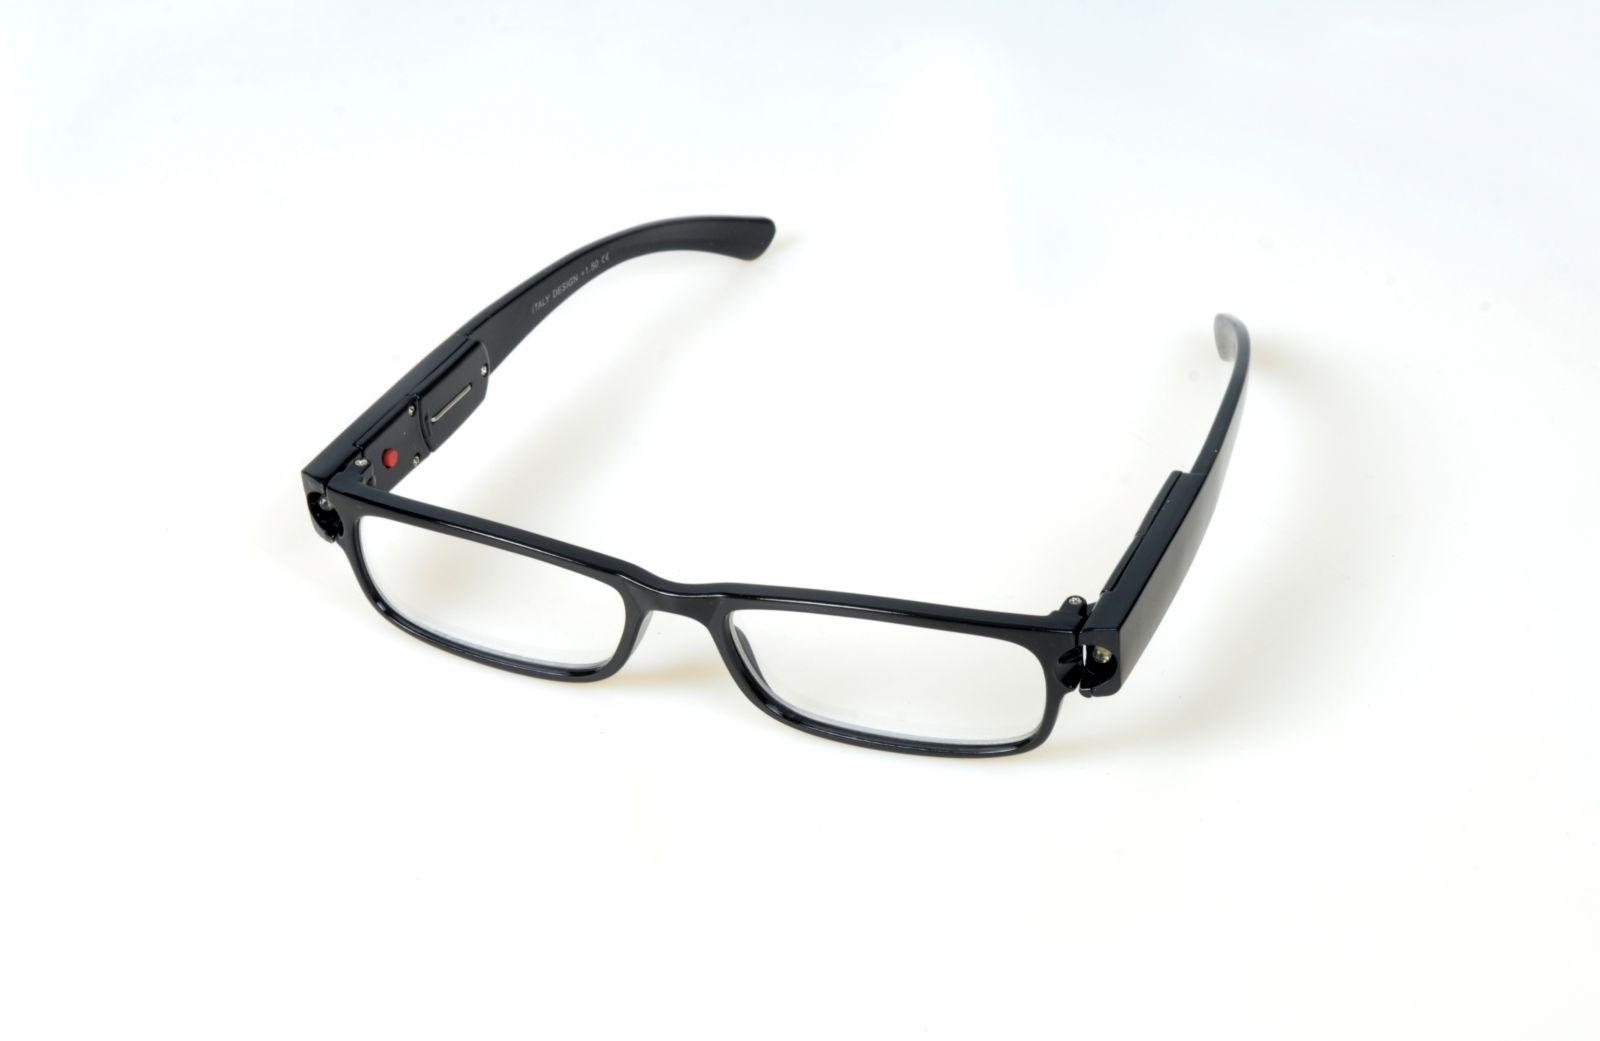 Dioptrické brýle se světýlkama +3,00